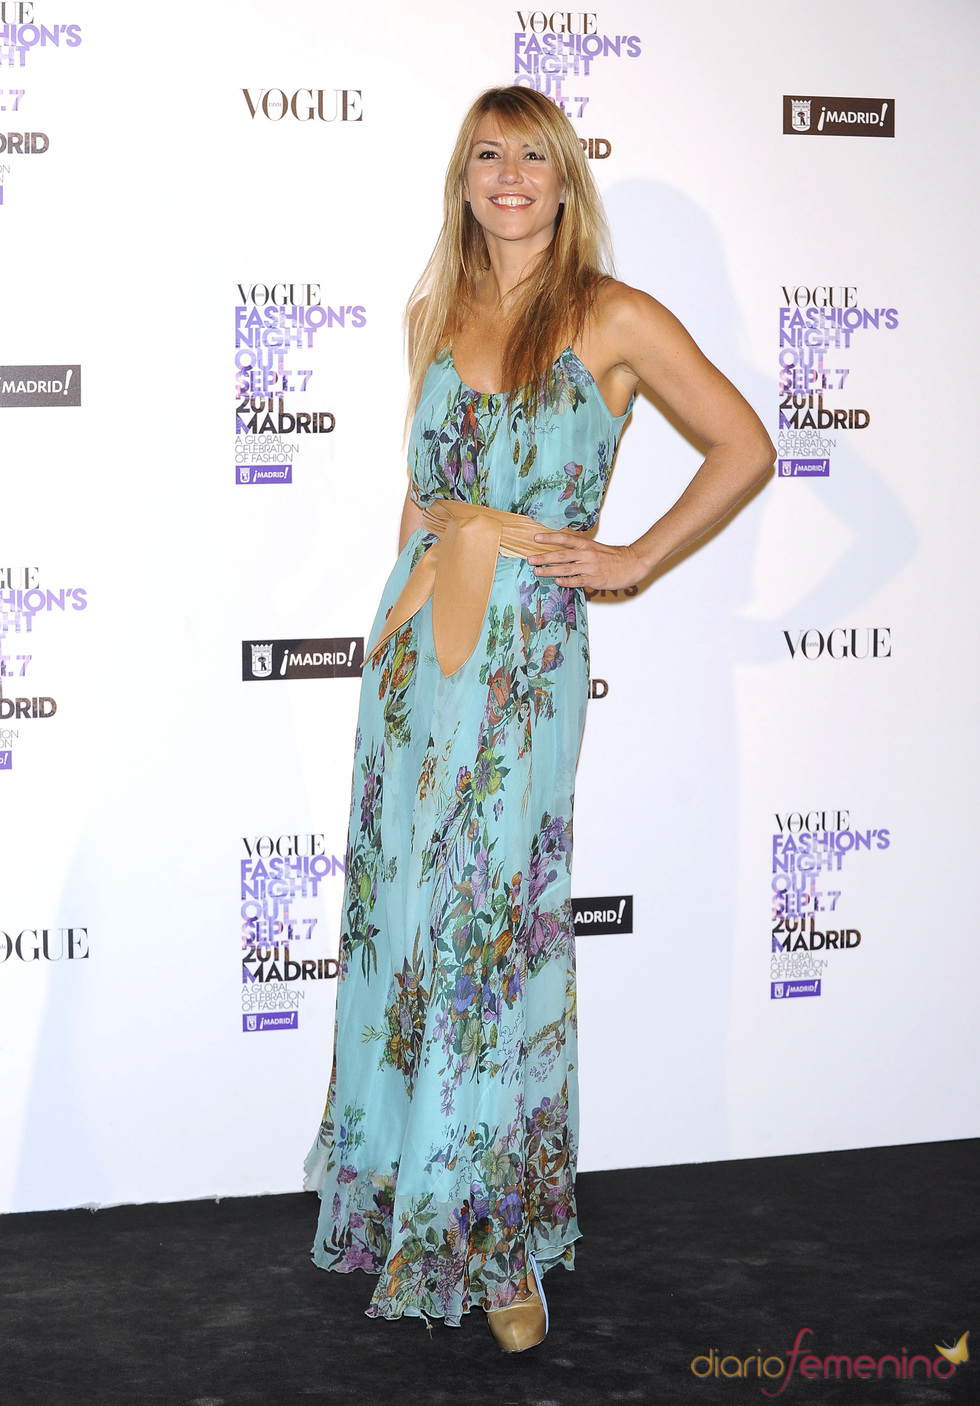 Raquel Meroño durante la Vogue Fashion Night Out Madrid 2011